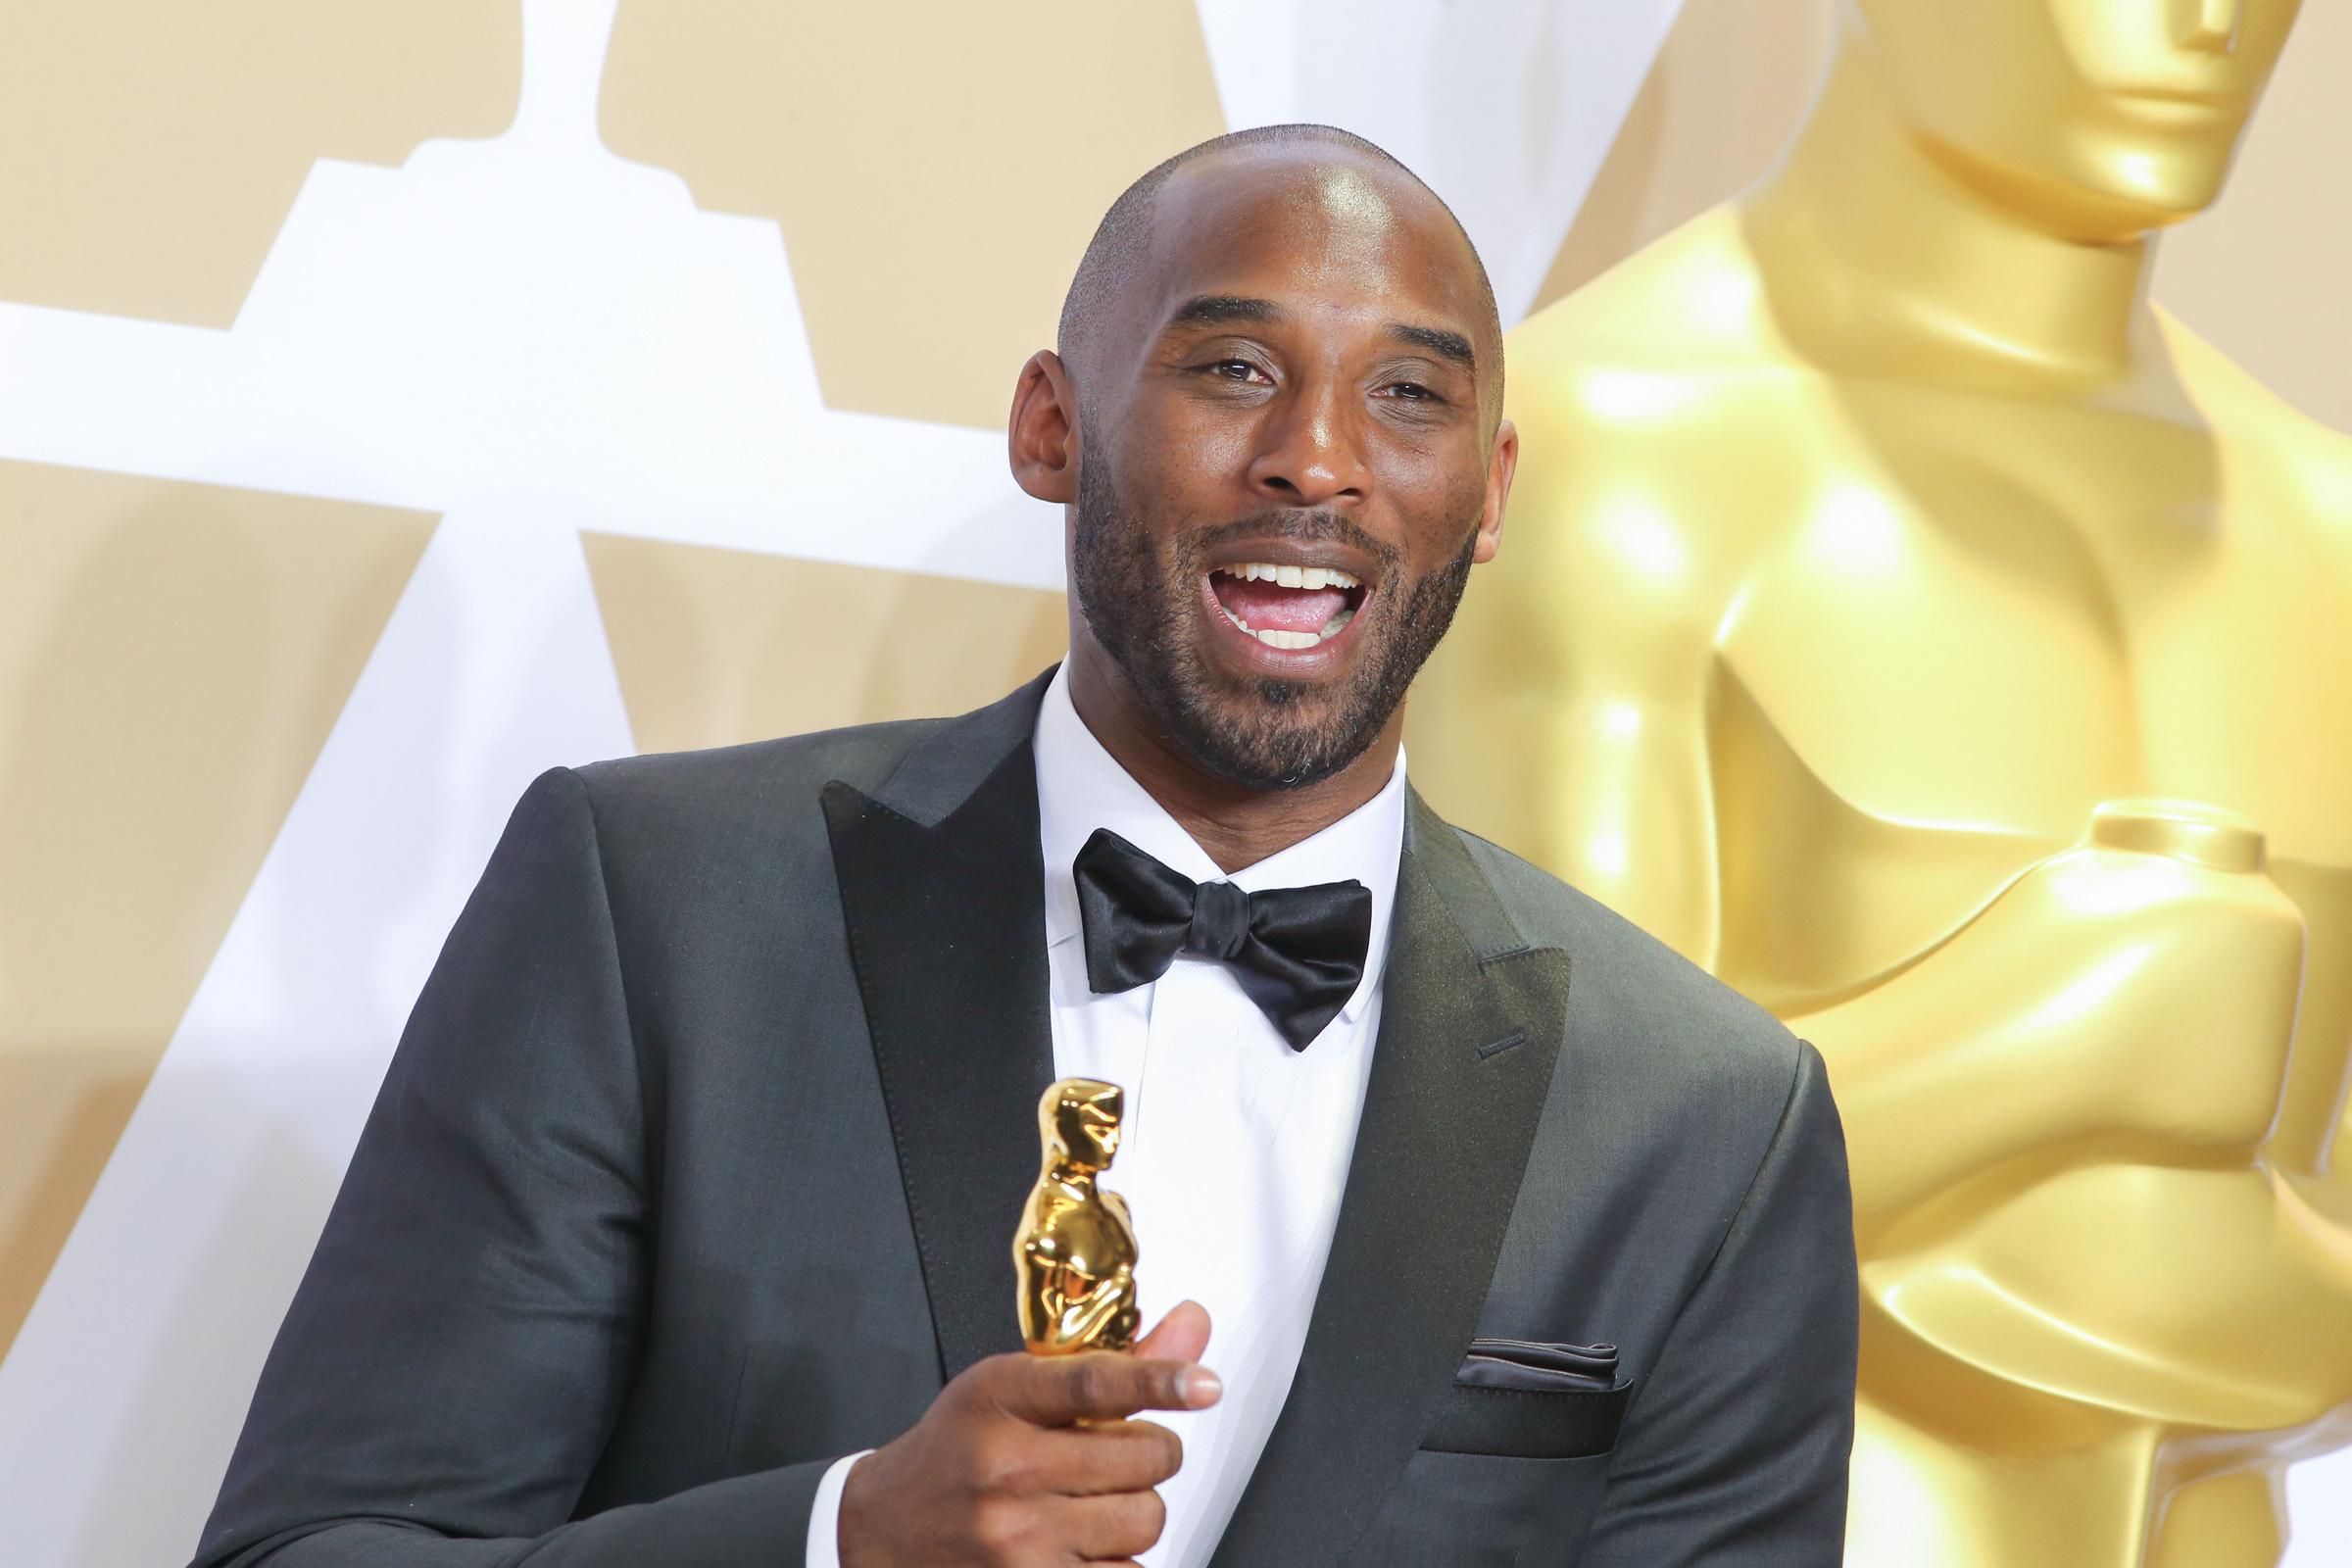 Despite Oscar Win, Kobe Bryant Not Invited To Join Academy